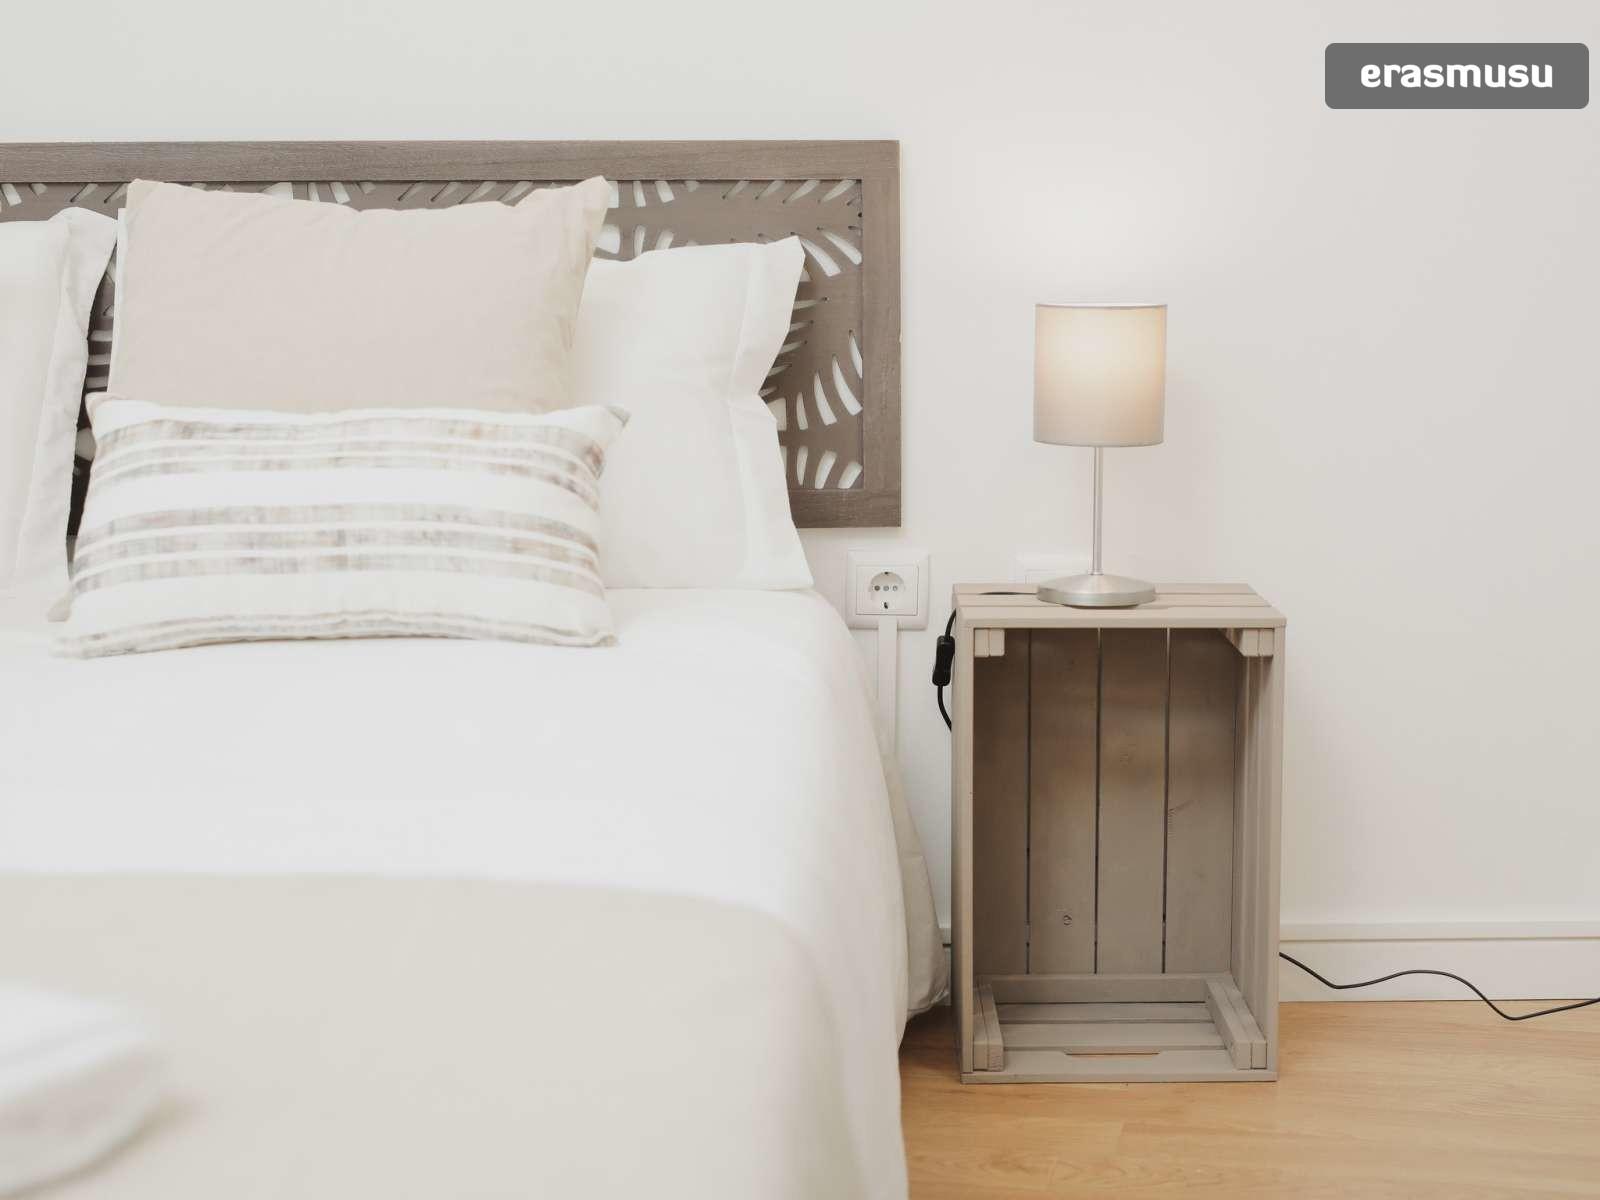 stunning-studio-apartment-rent-santo-ildefonso-27ef9274670f7428d